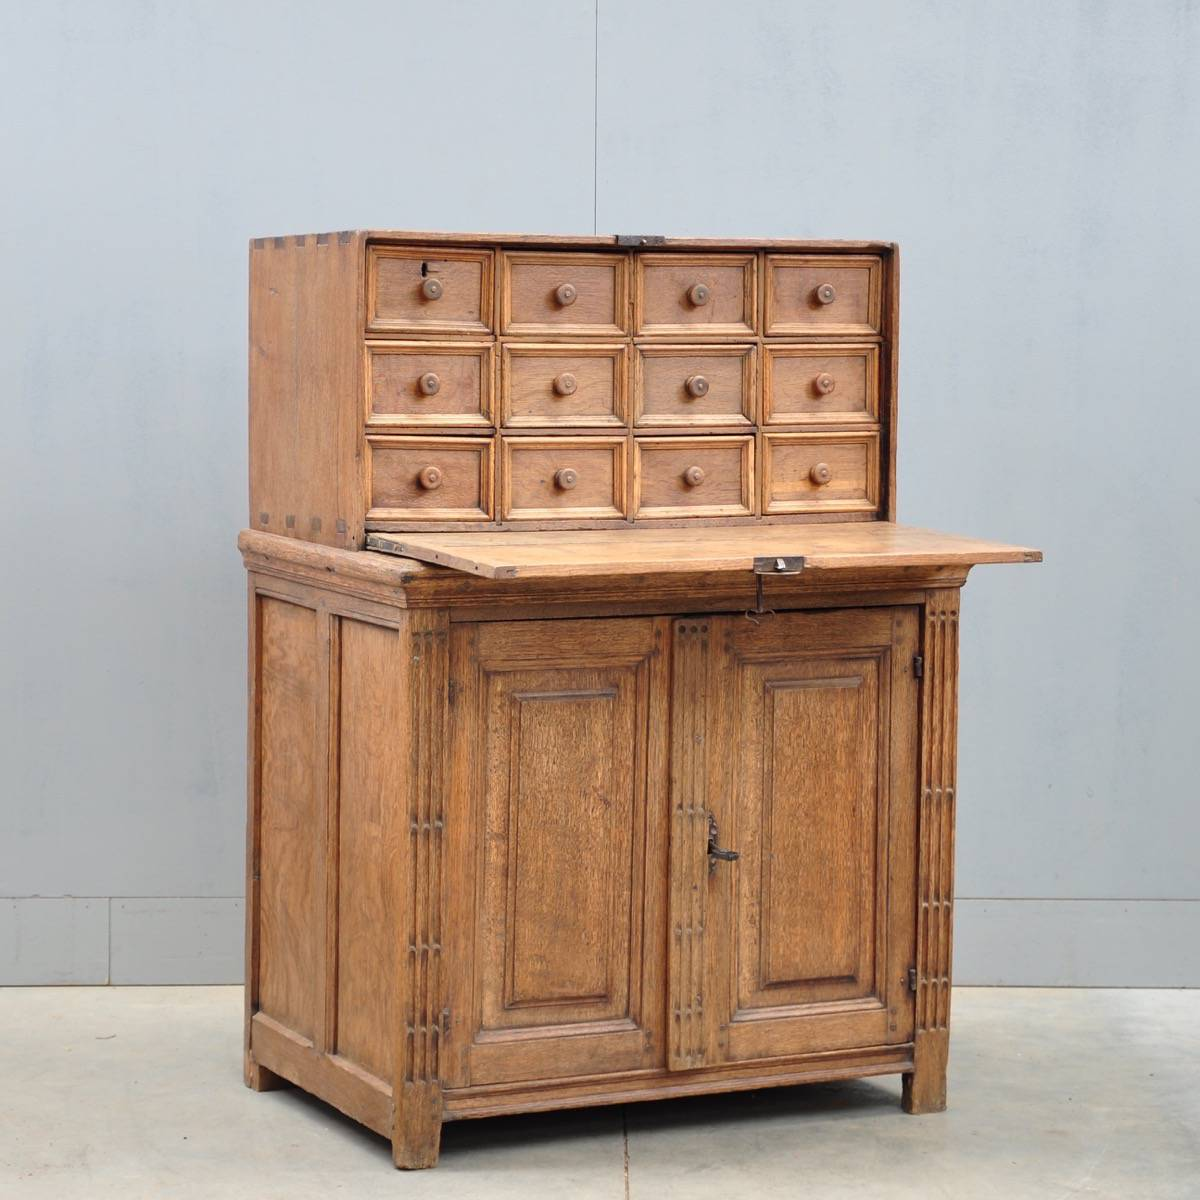 Flemish oak cabinet. Antique ... - Flemish Oak Cabinet De Grande Antique Furniture